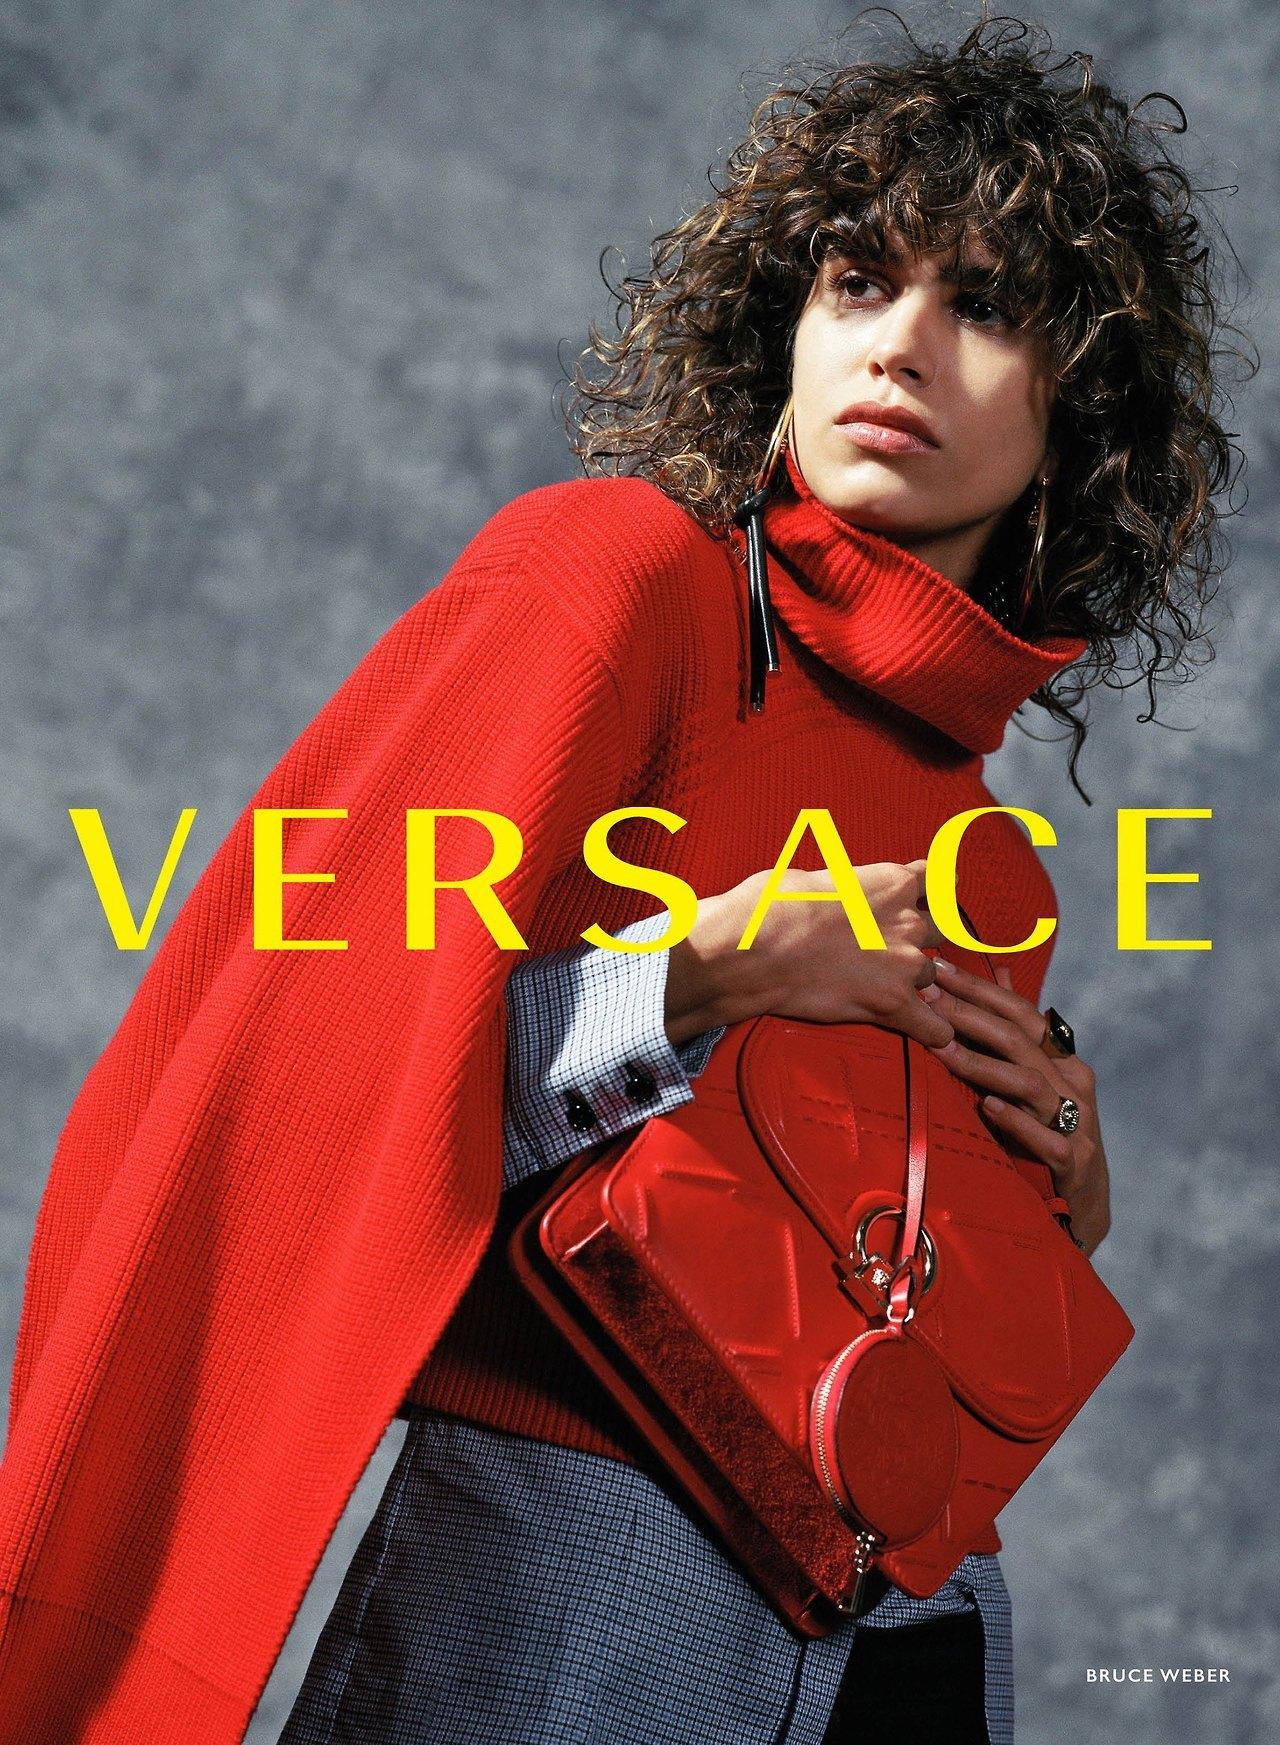 Gigi Hadid, Mica Arganaraz, Taylor Hill, Vittoria Ceretti - Versace Fall/Winter 2017-2018